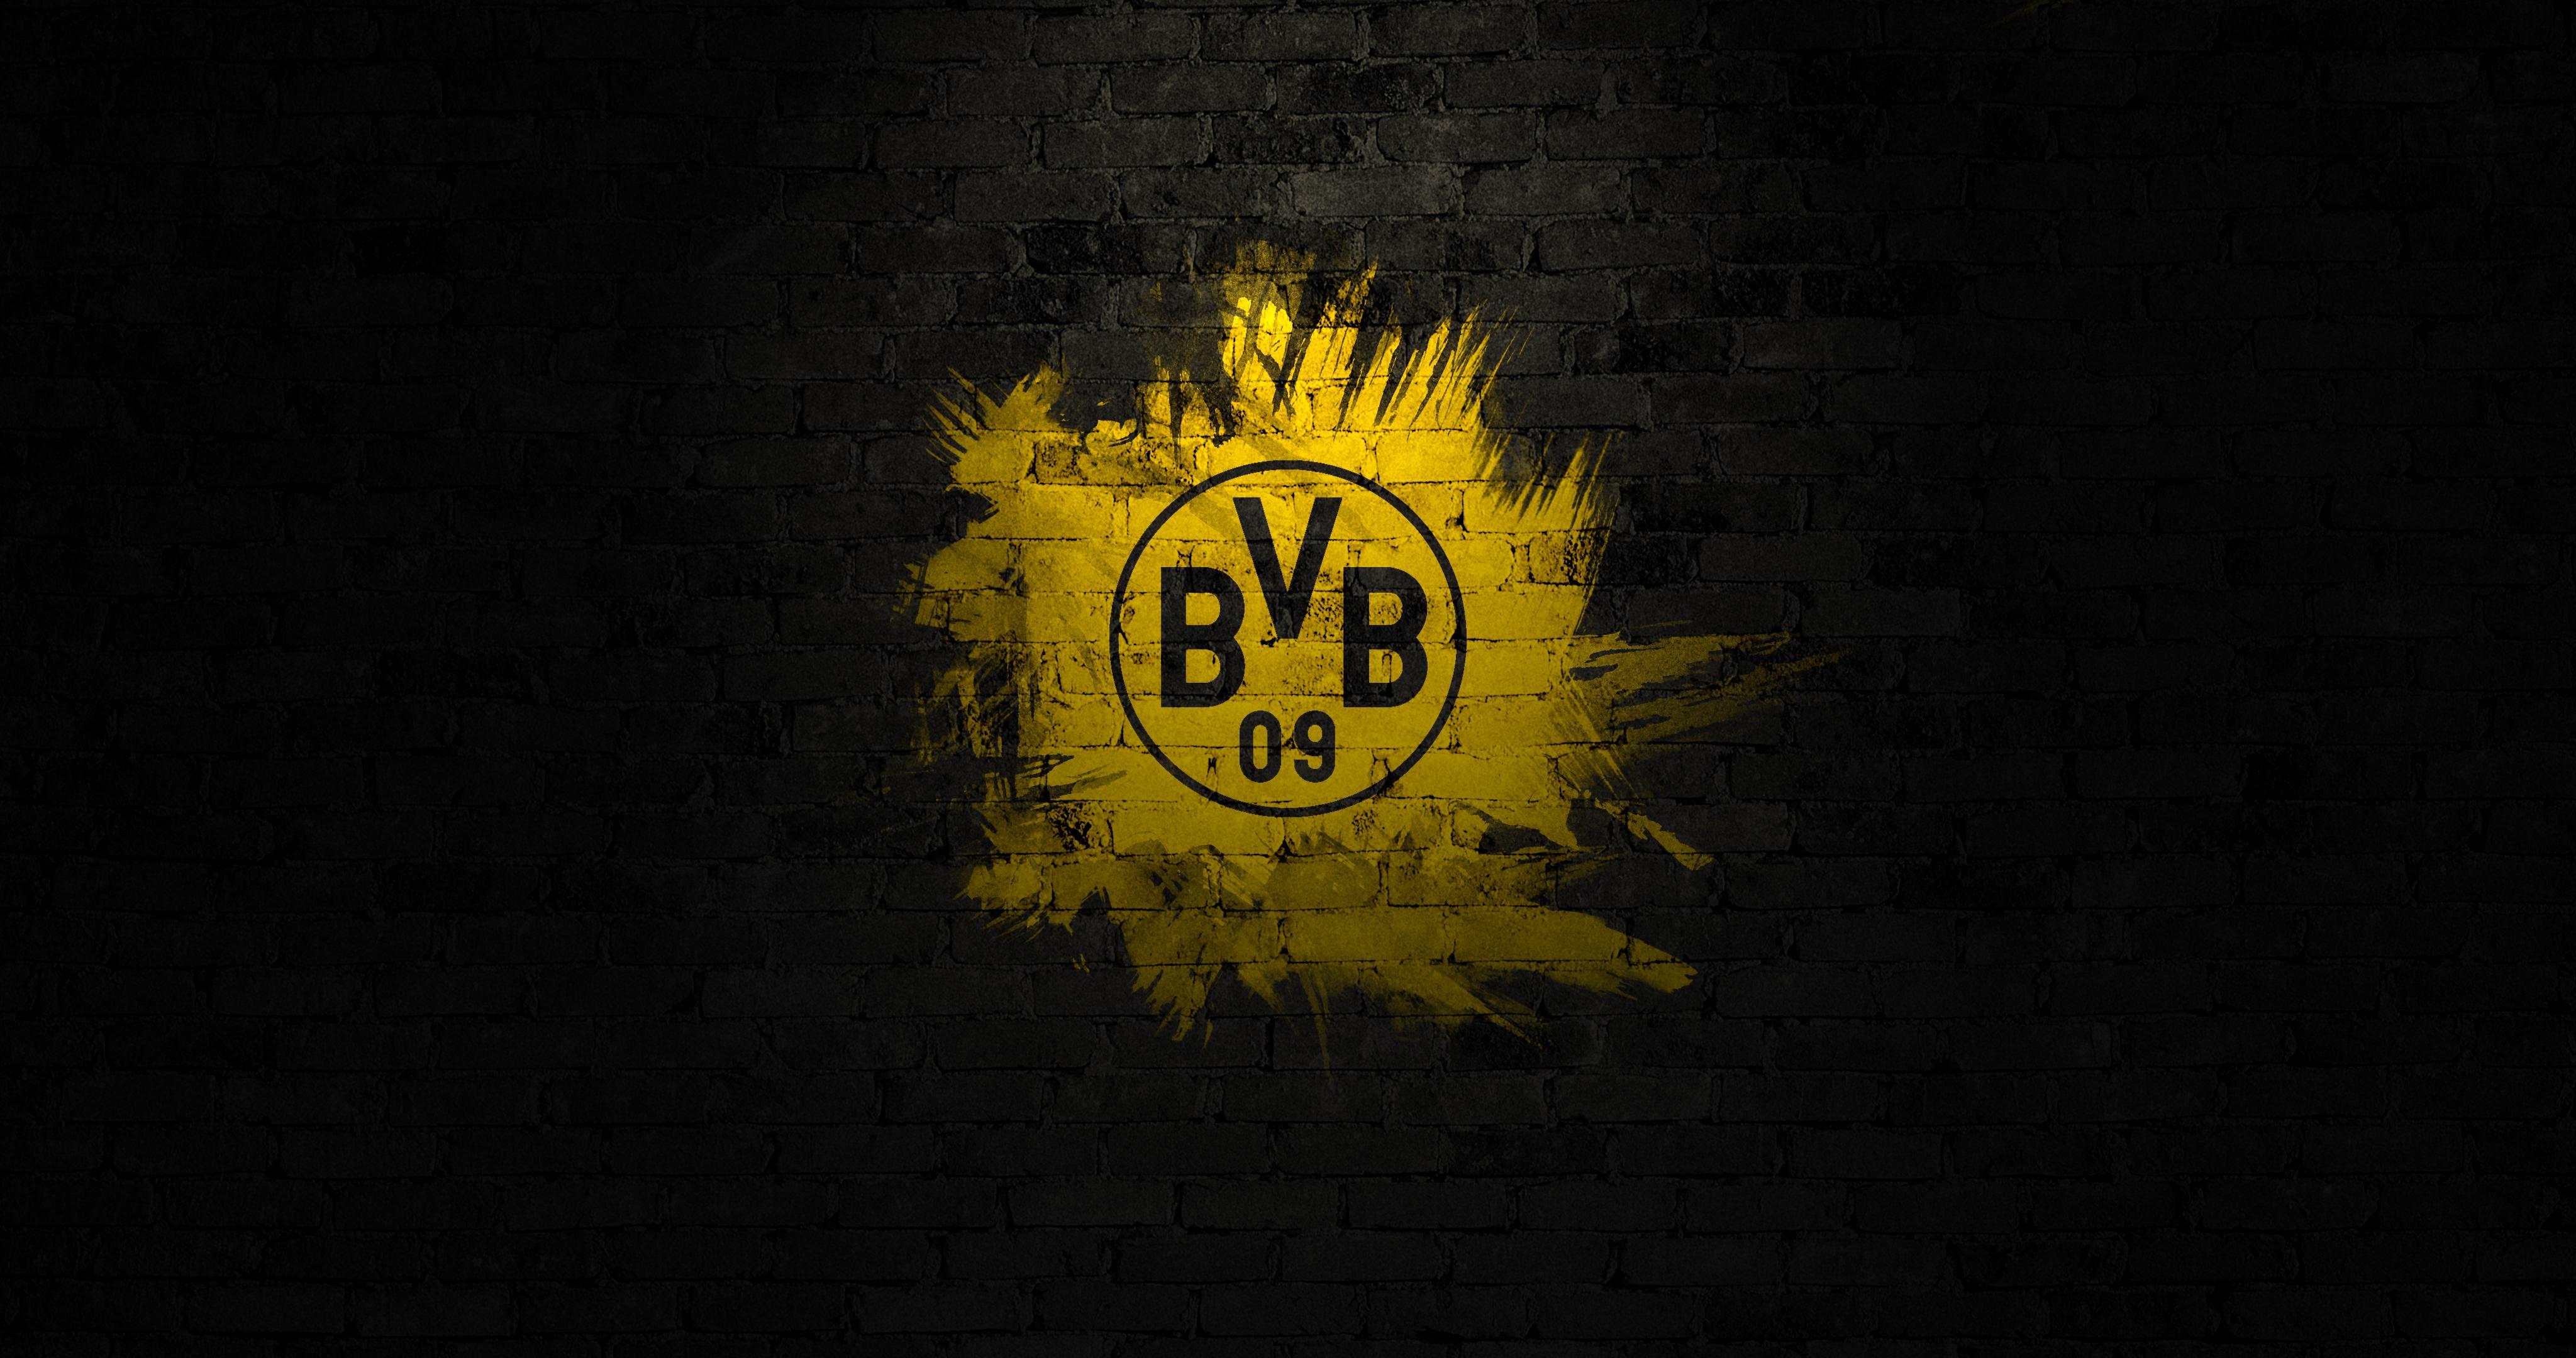 Borussia Dortmund 4k Ultra HD Wallpaper Background Image 4096x2160